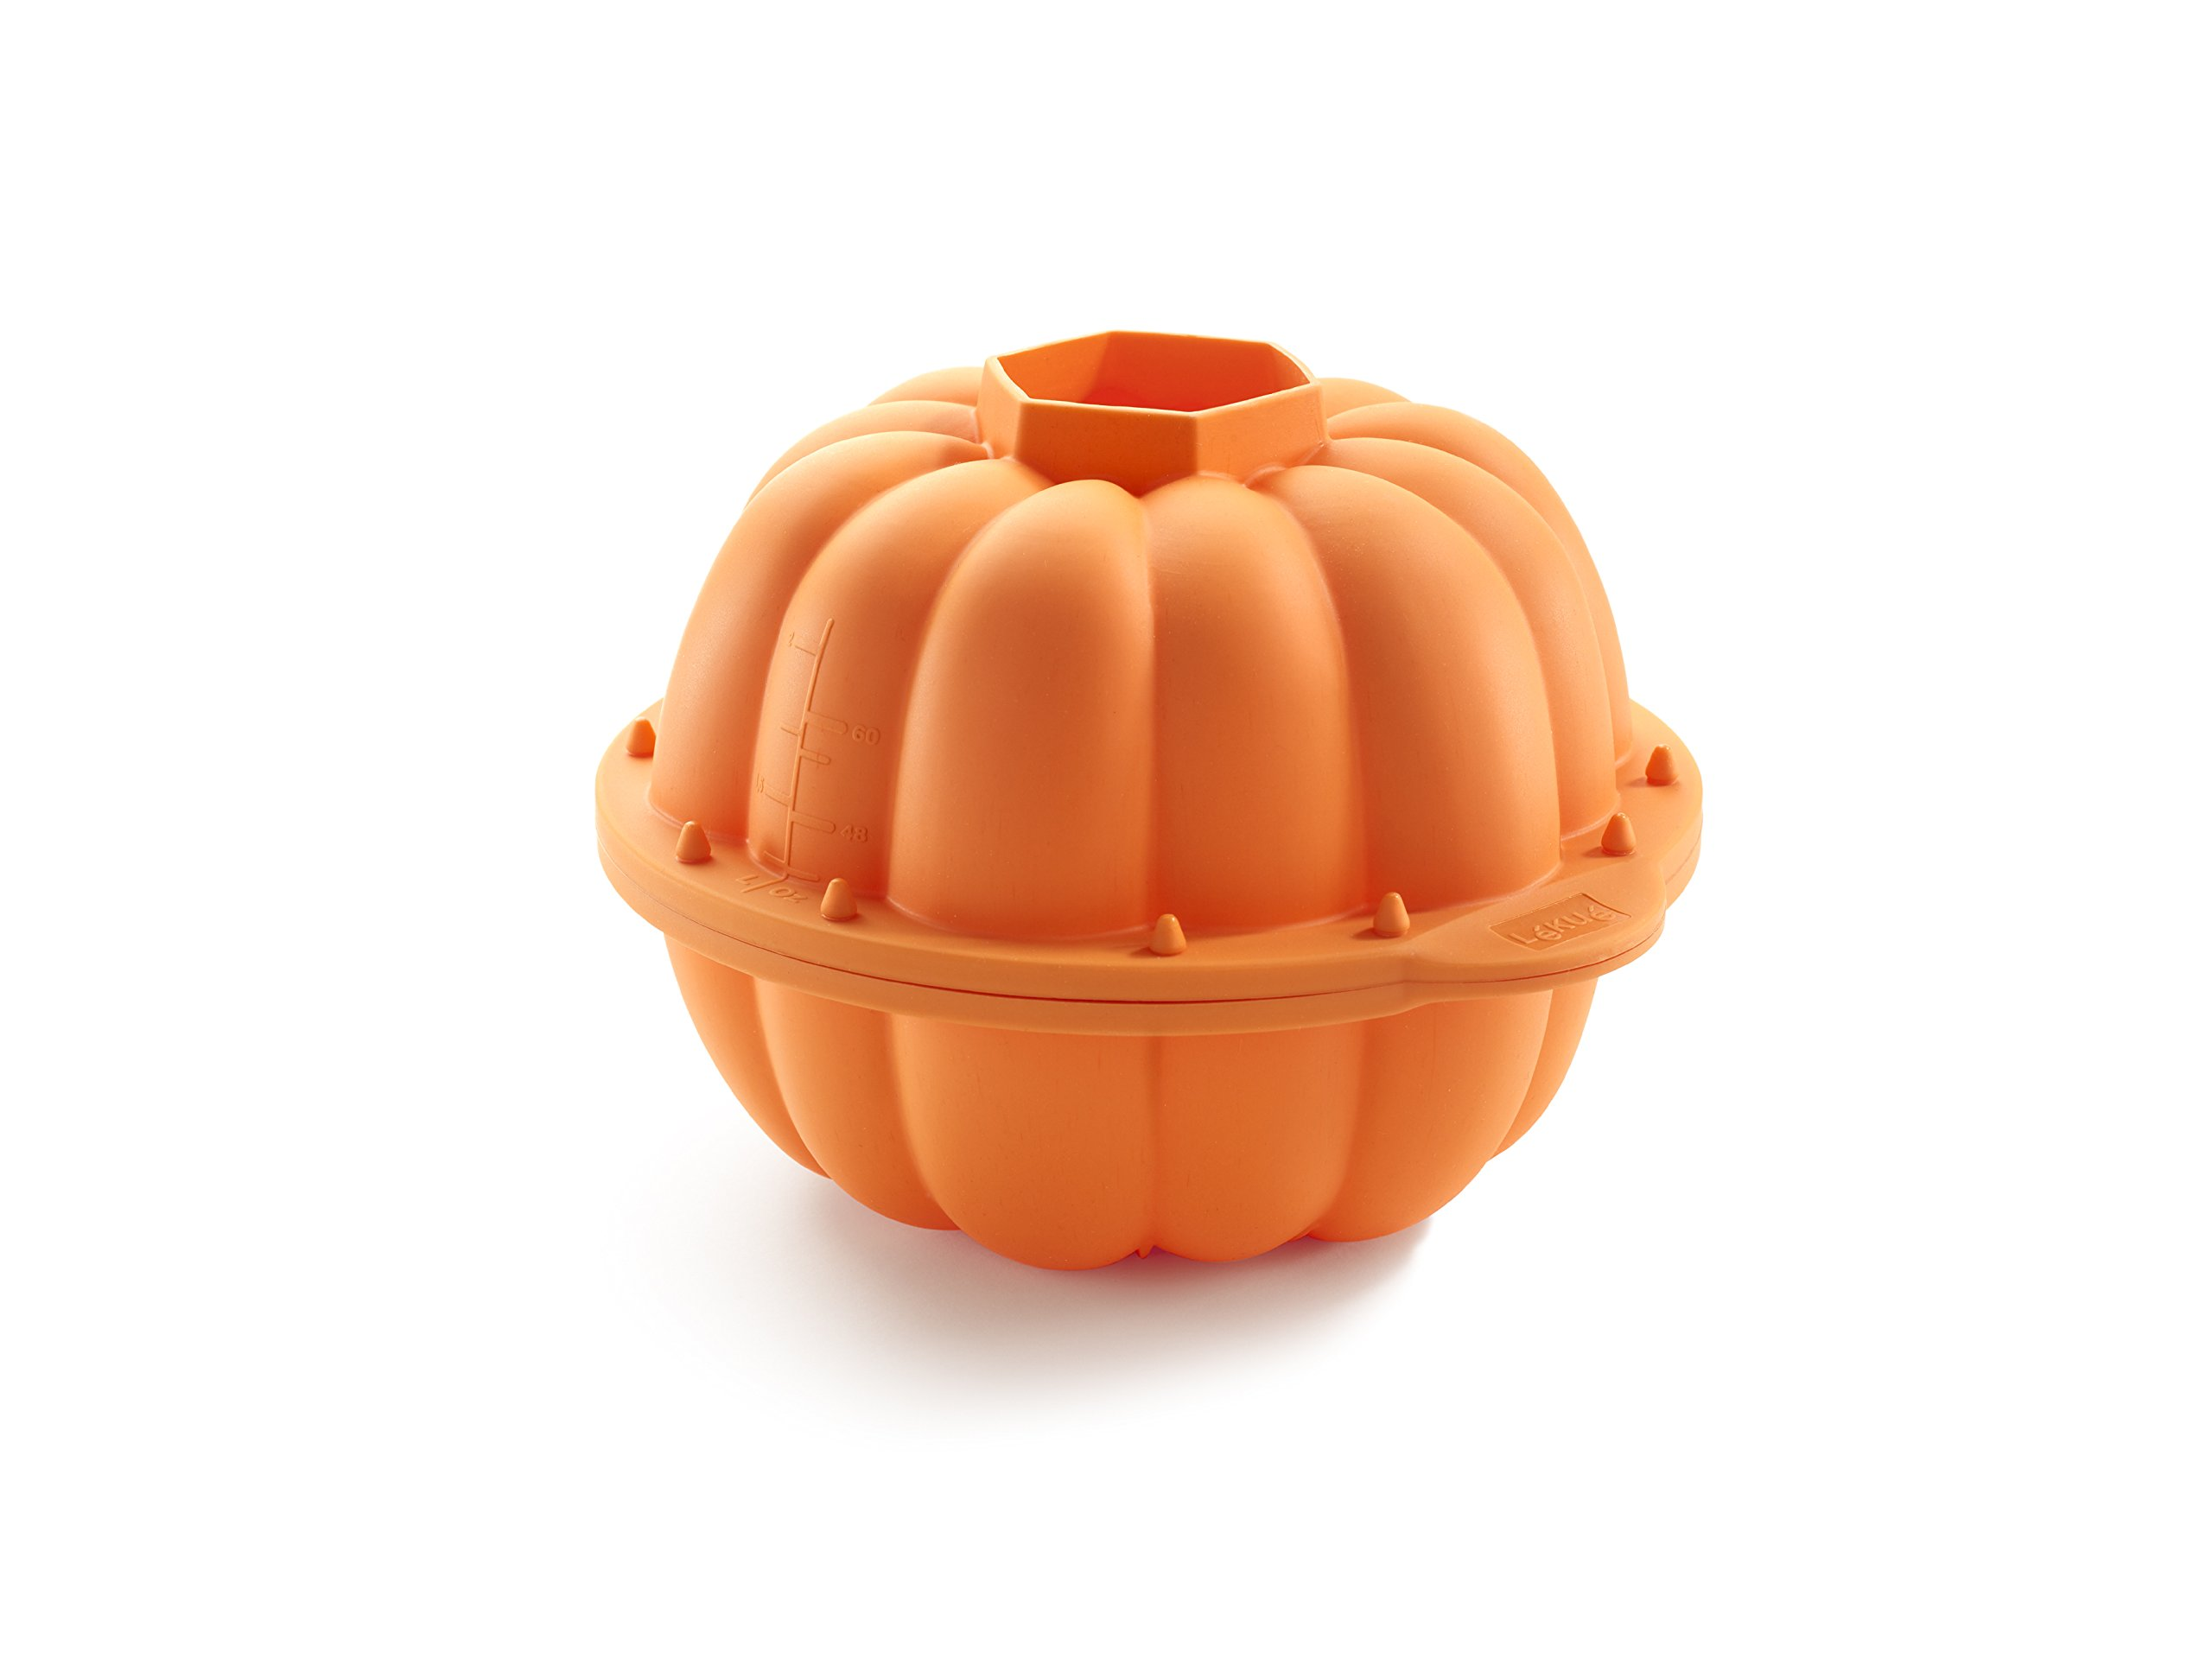 Lekue Pumpkin 3D Mold, Orange by Lekue (Image #2)